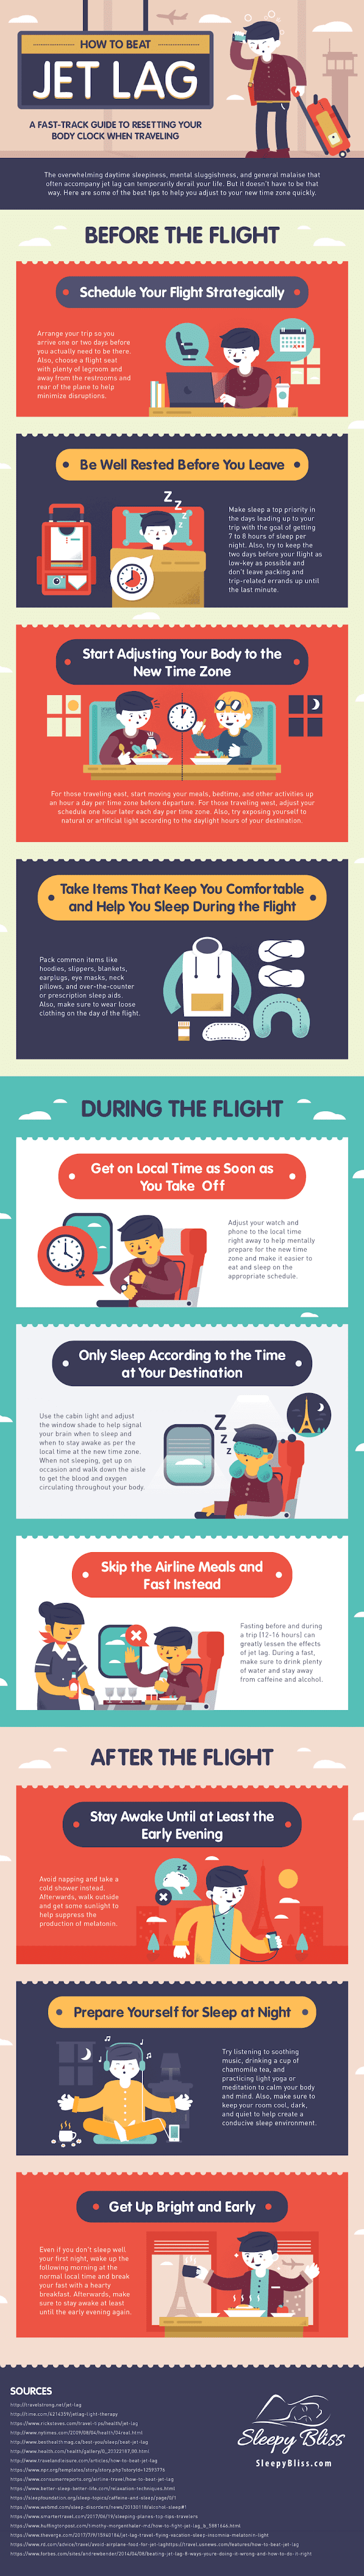 How to Beat Jet Lag #infographic #Travel #Jet Lag